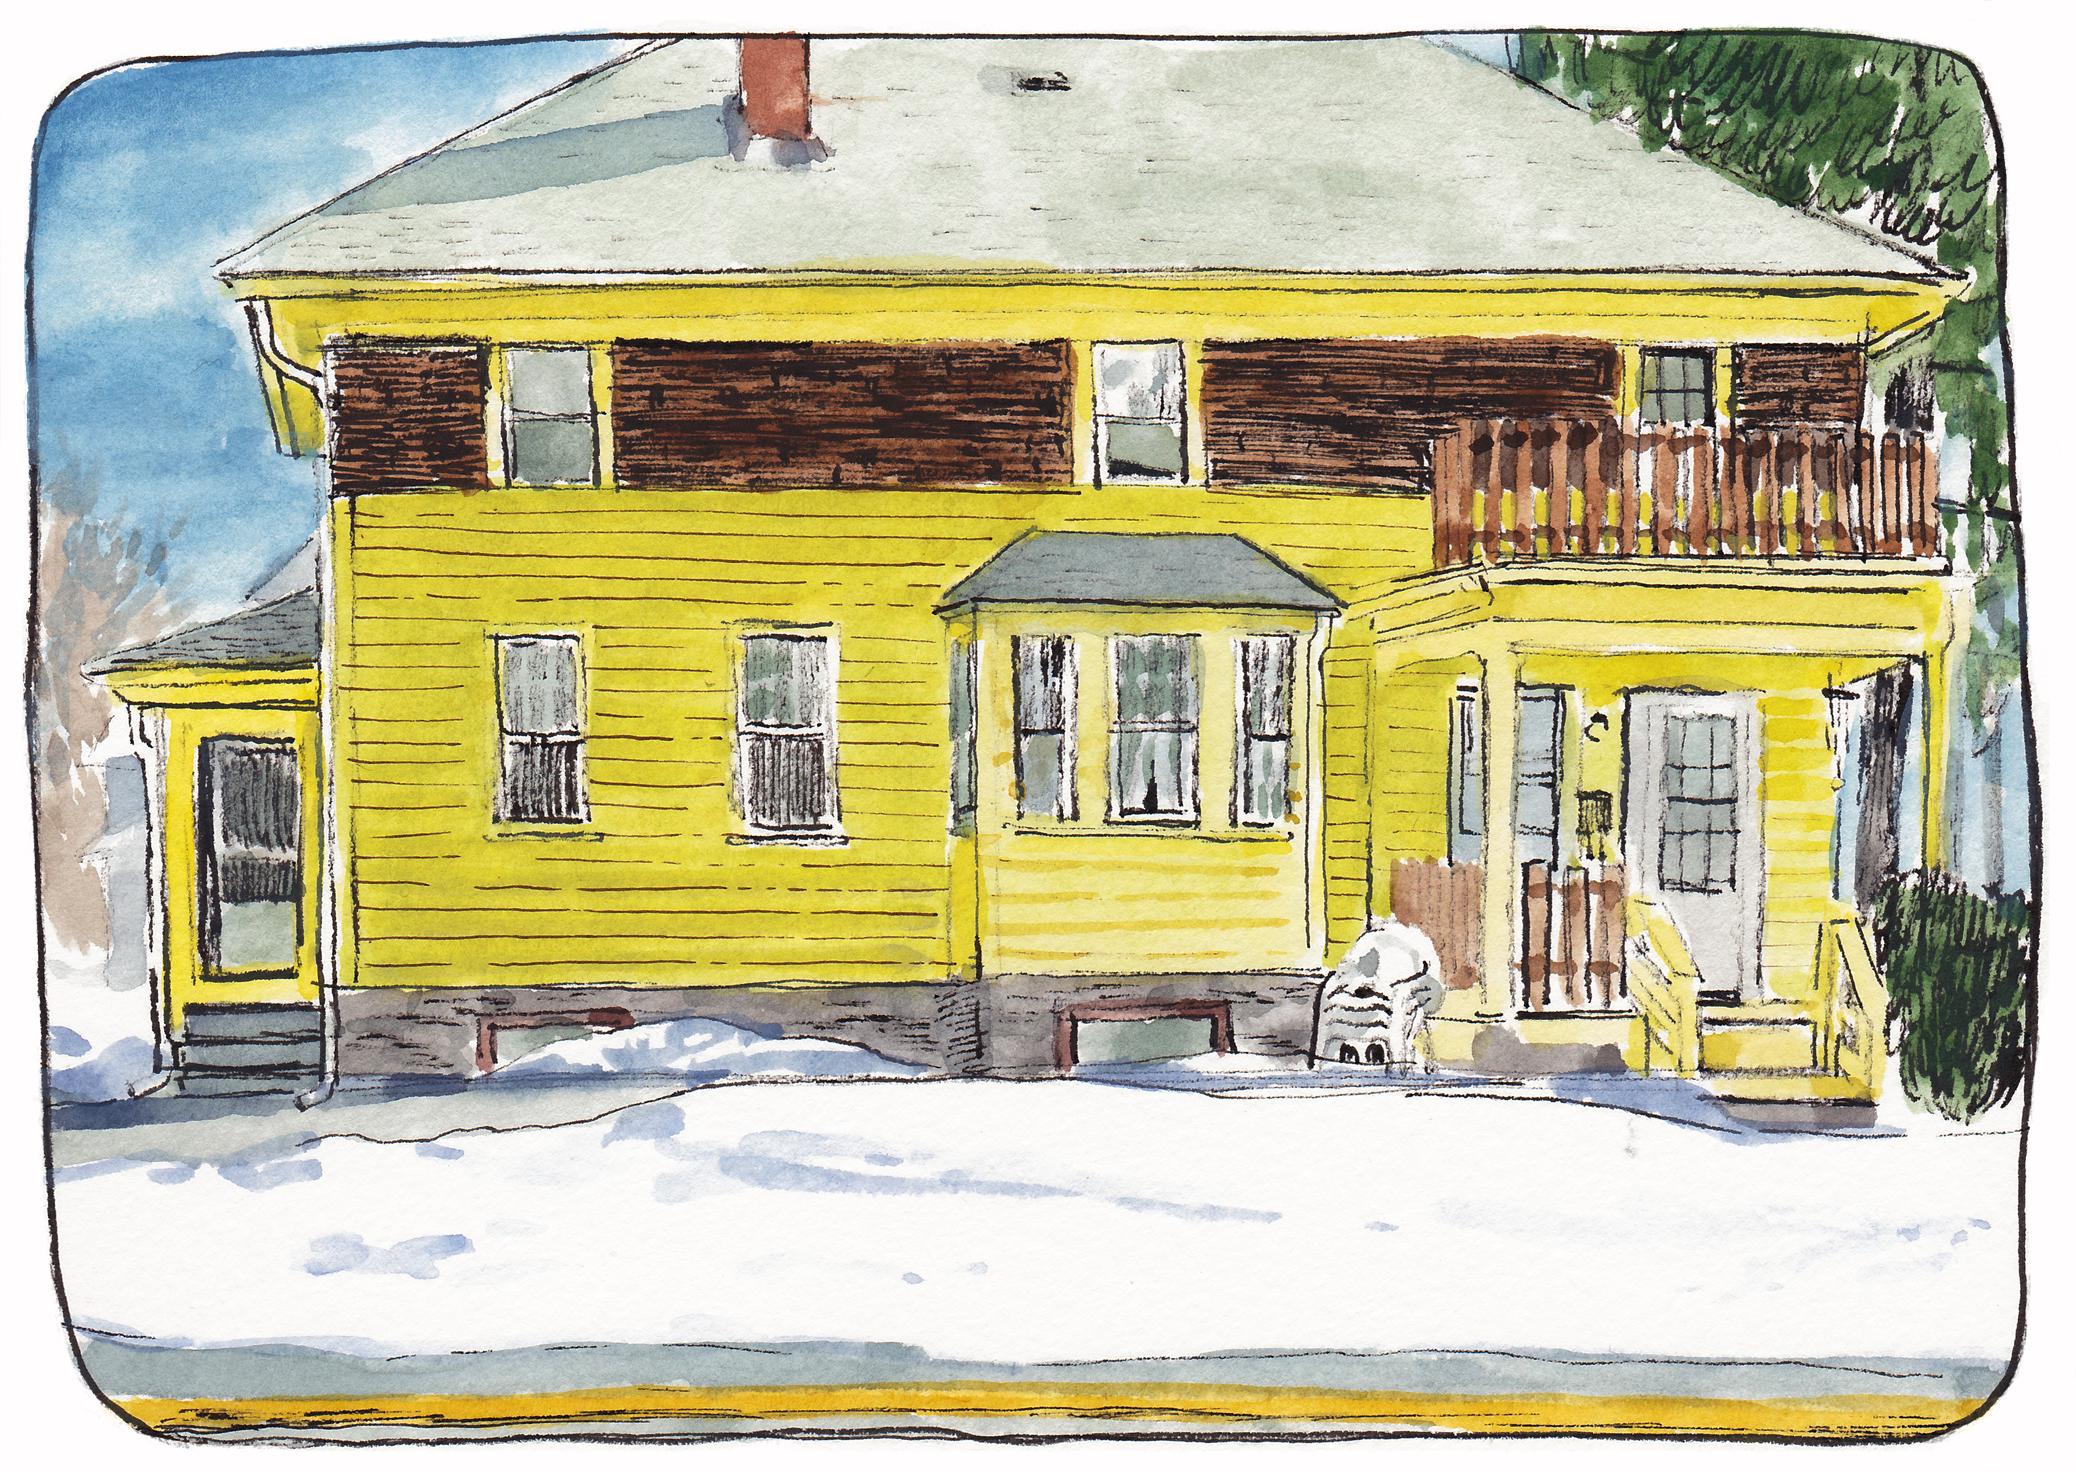 yellowhouse3.png